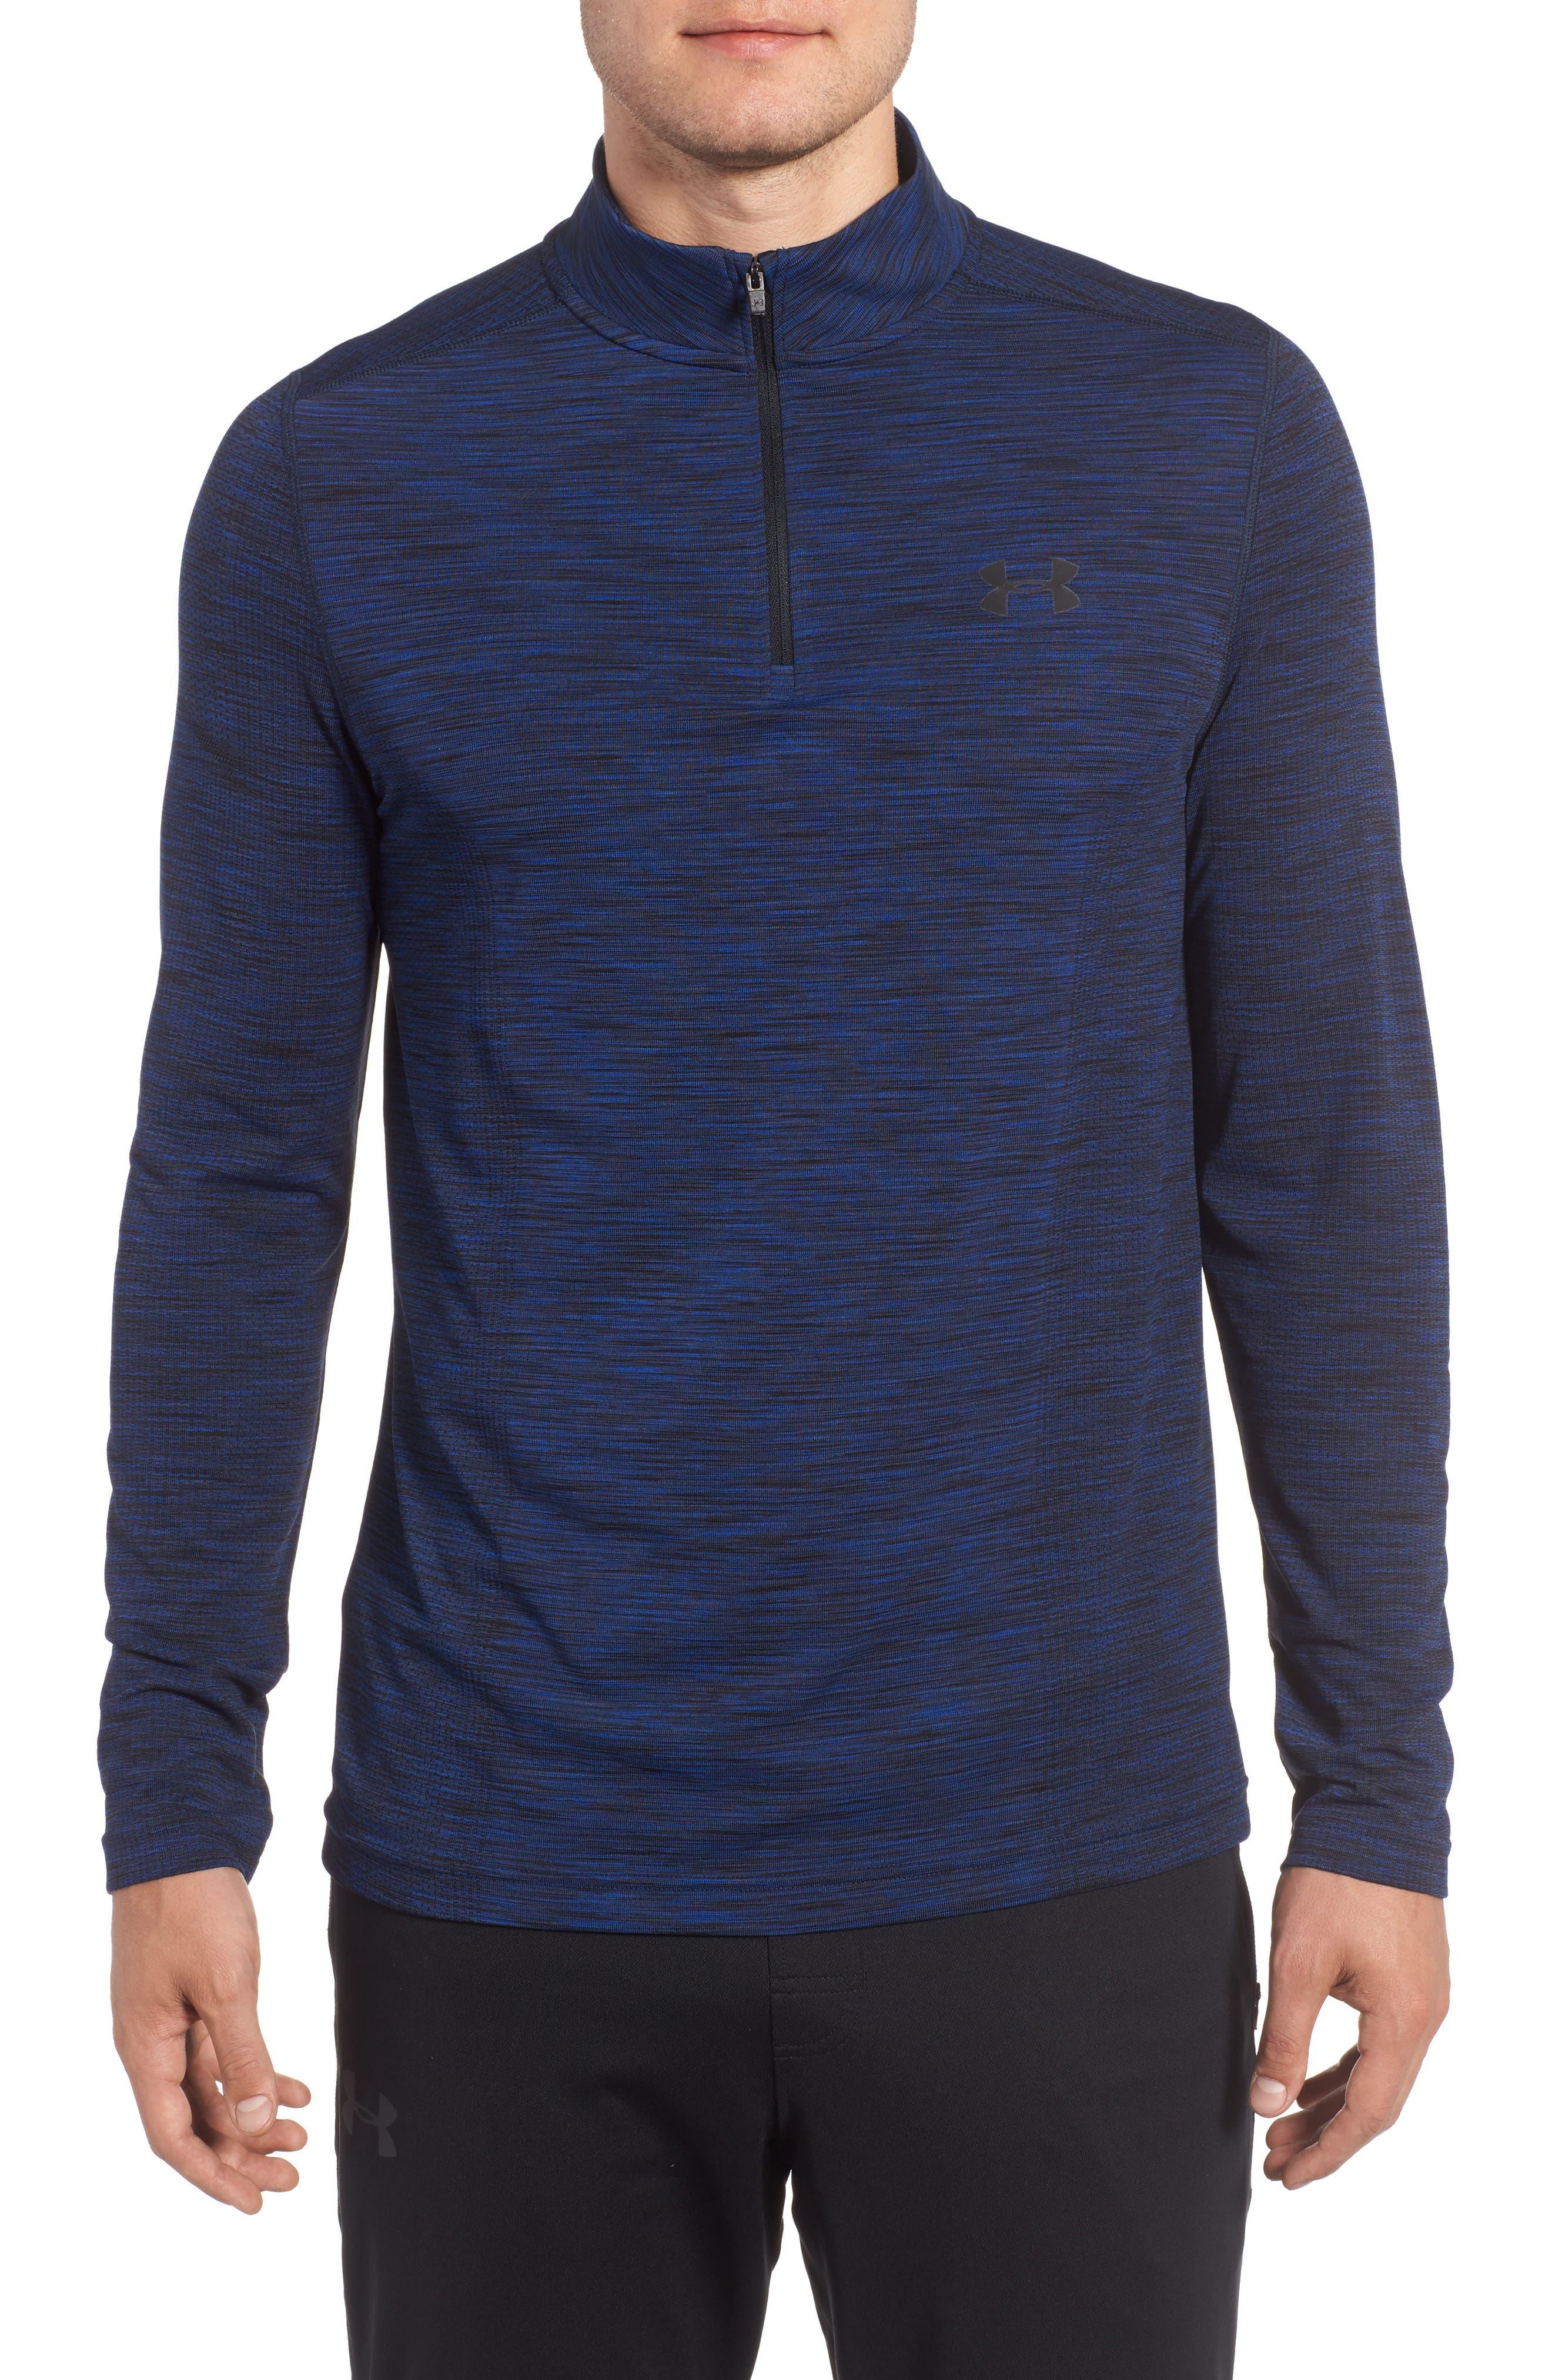 Threadborne Seamless Quarter Zip Pullover,                         Main,                         color, Blue